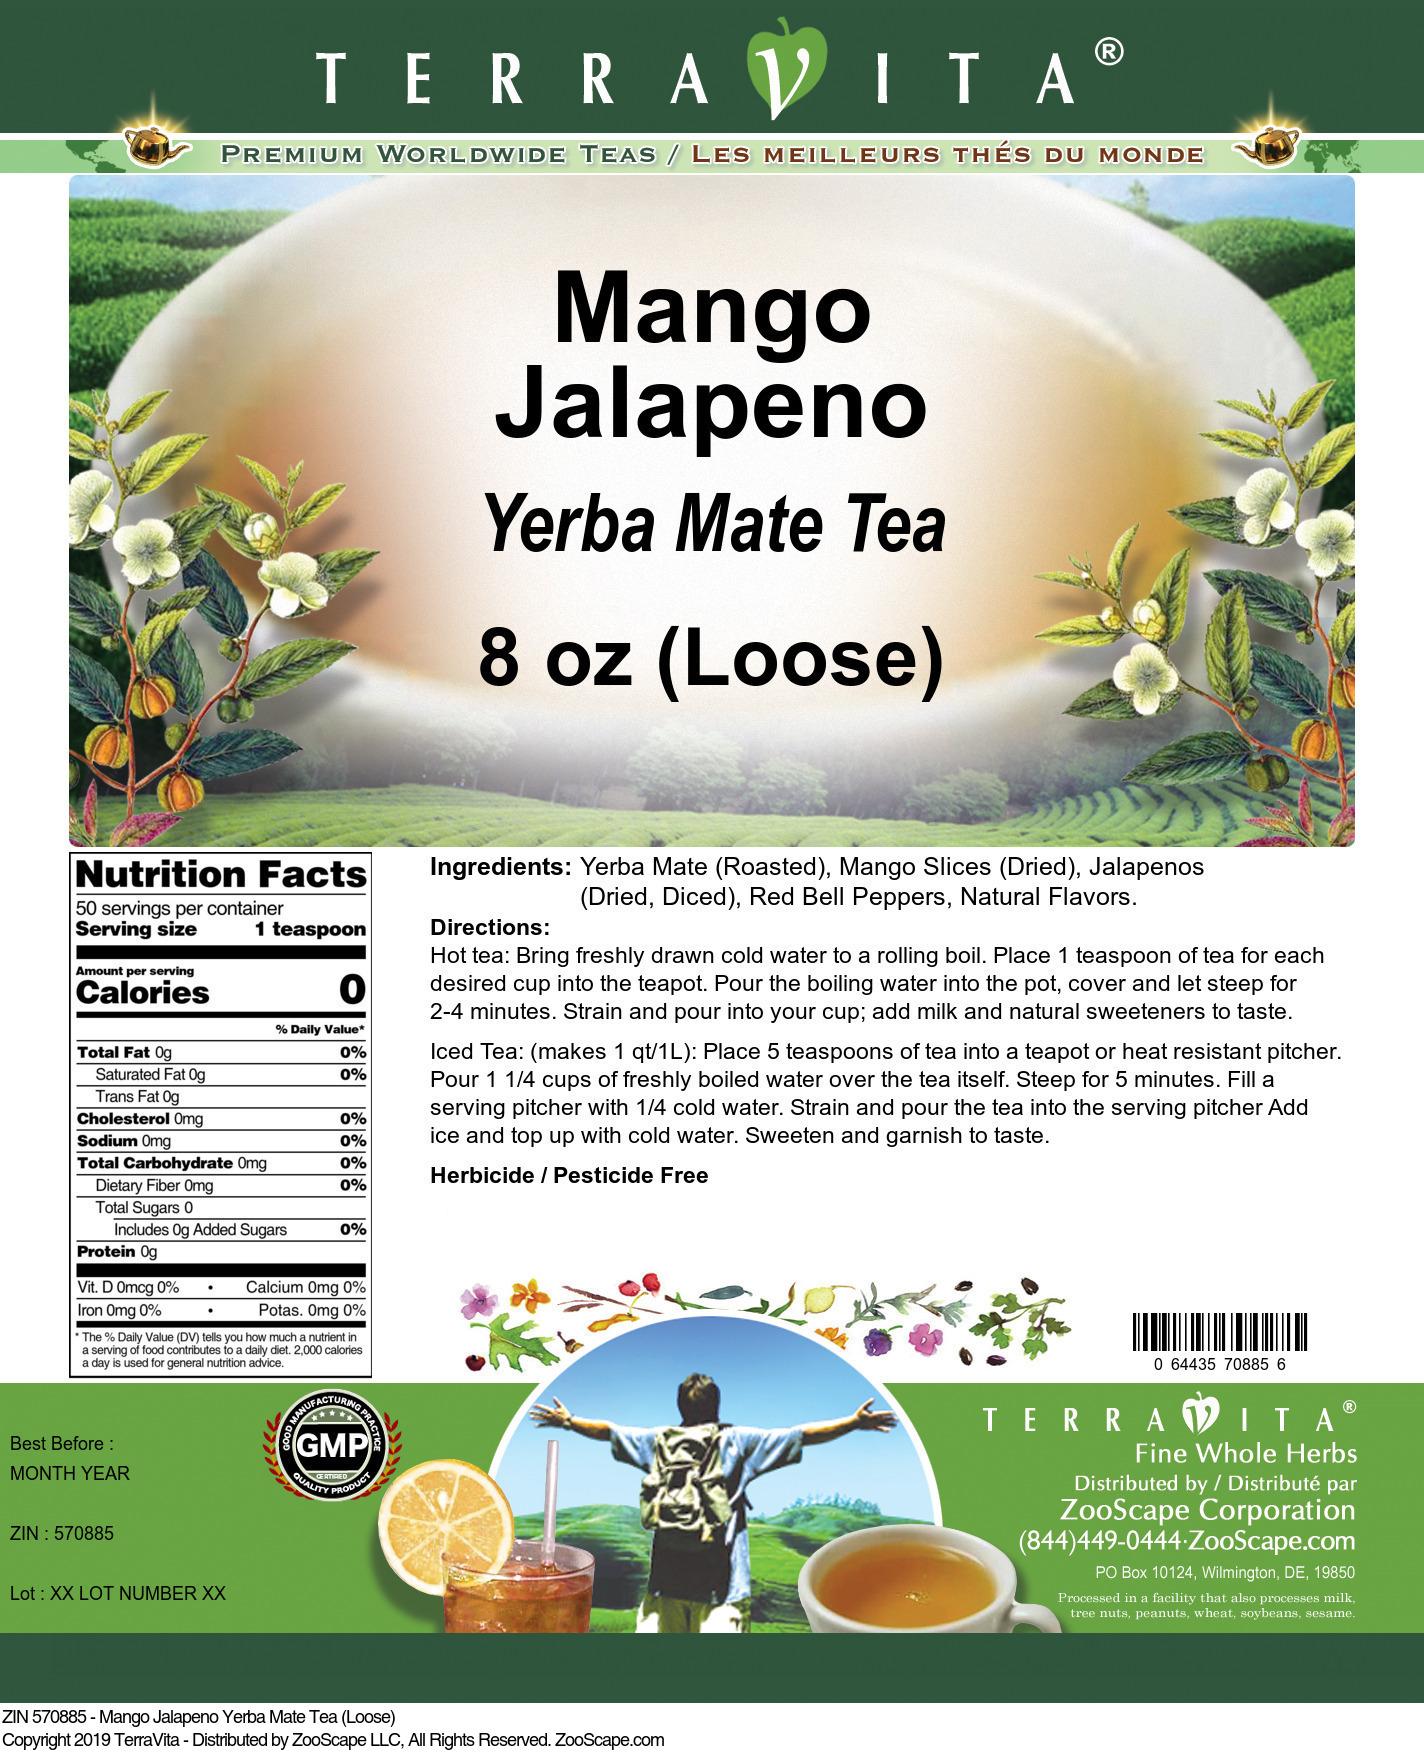 Mango Jalapeno Yerba Mate